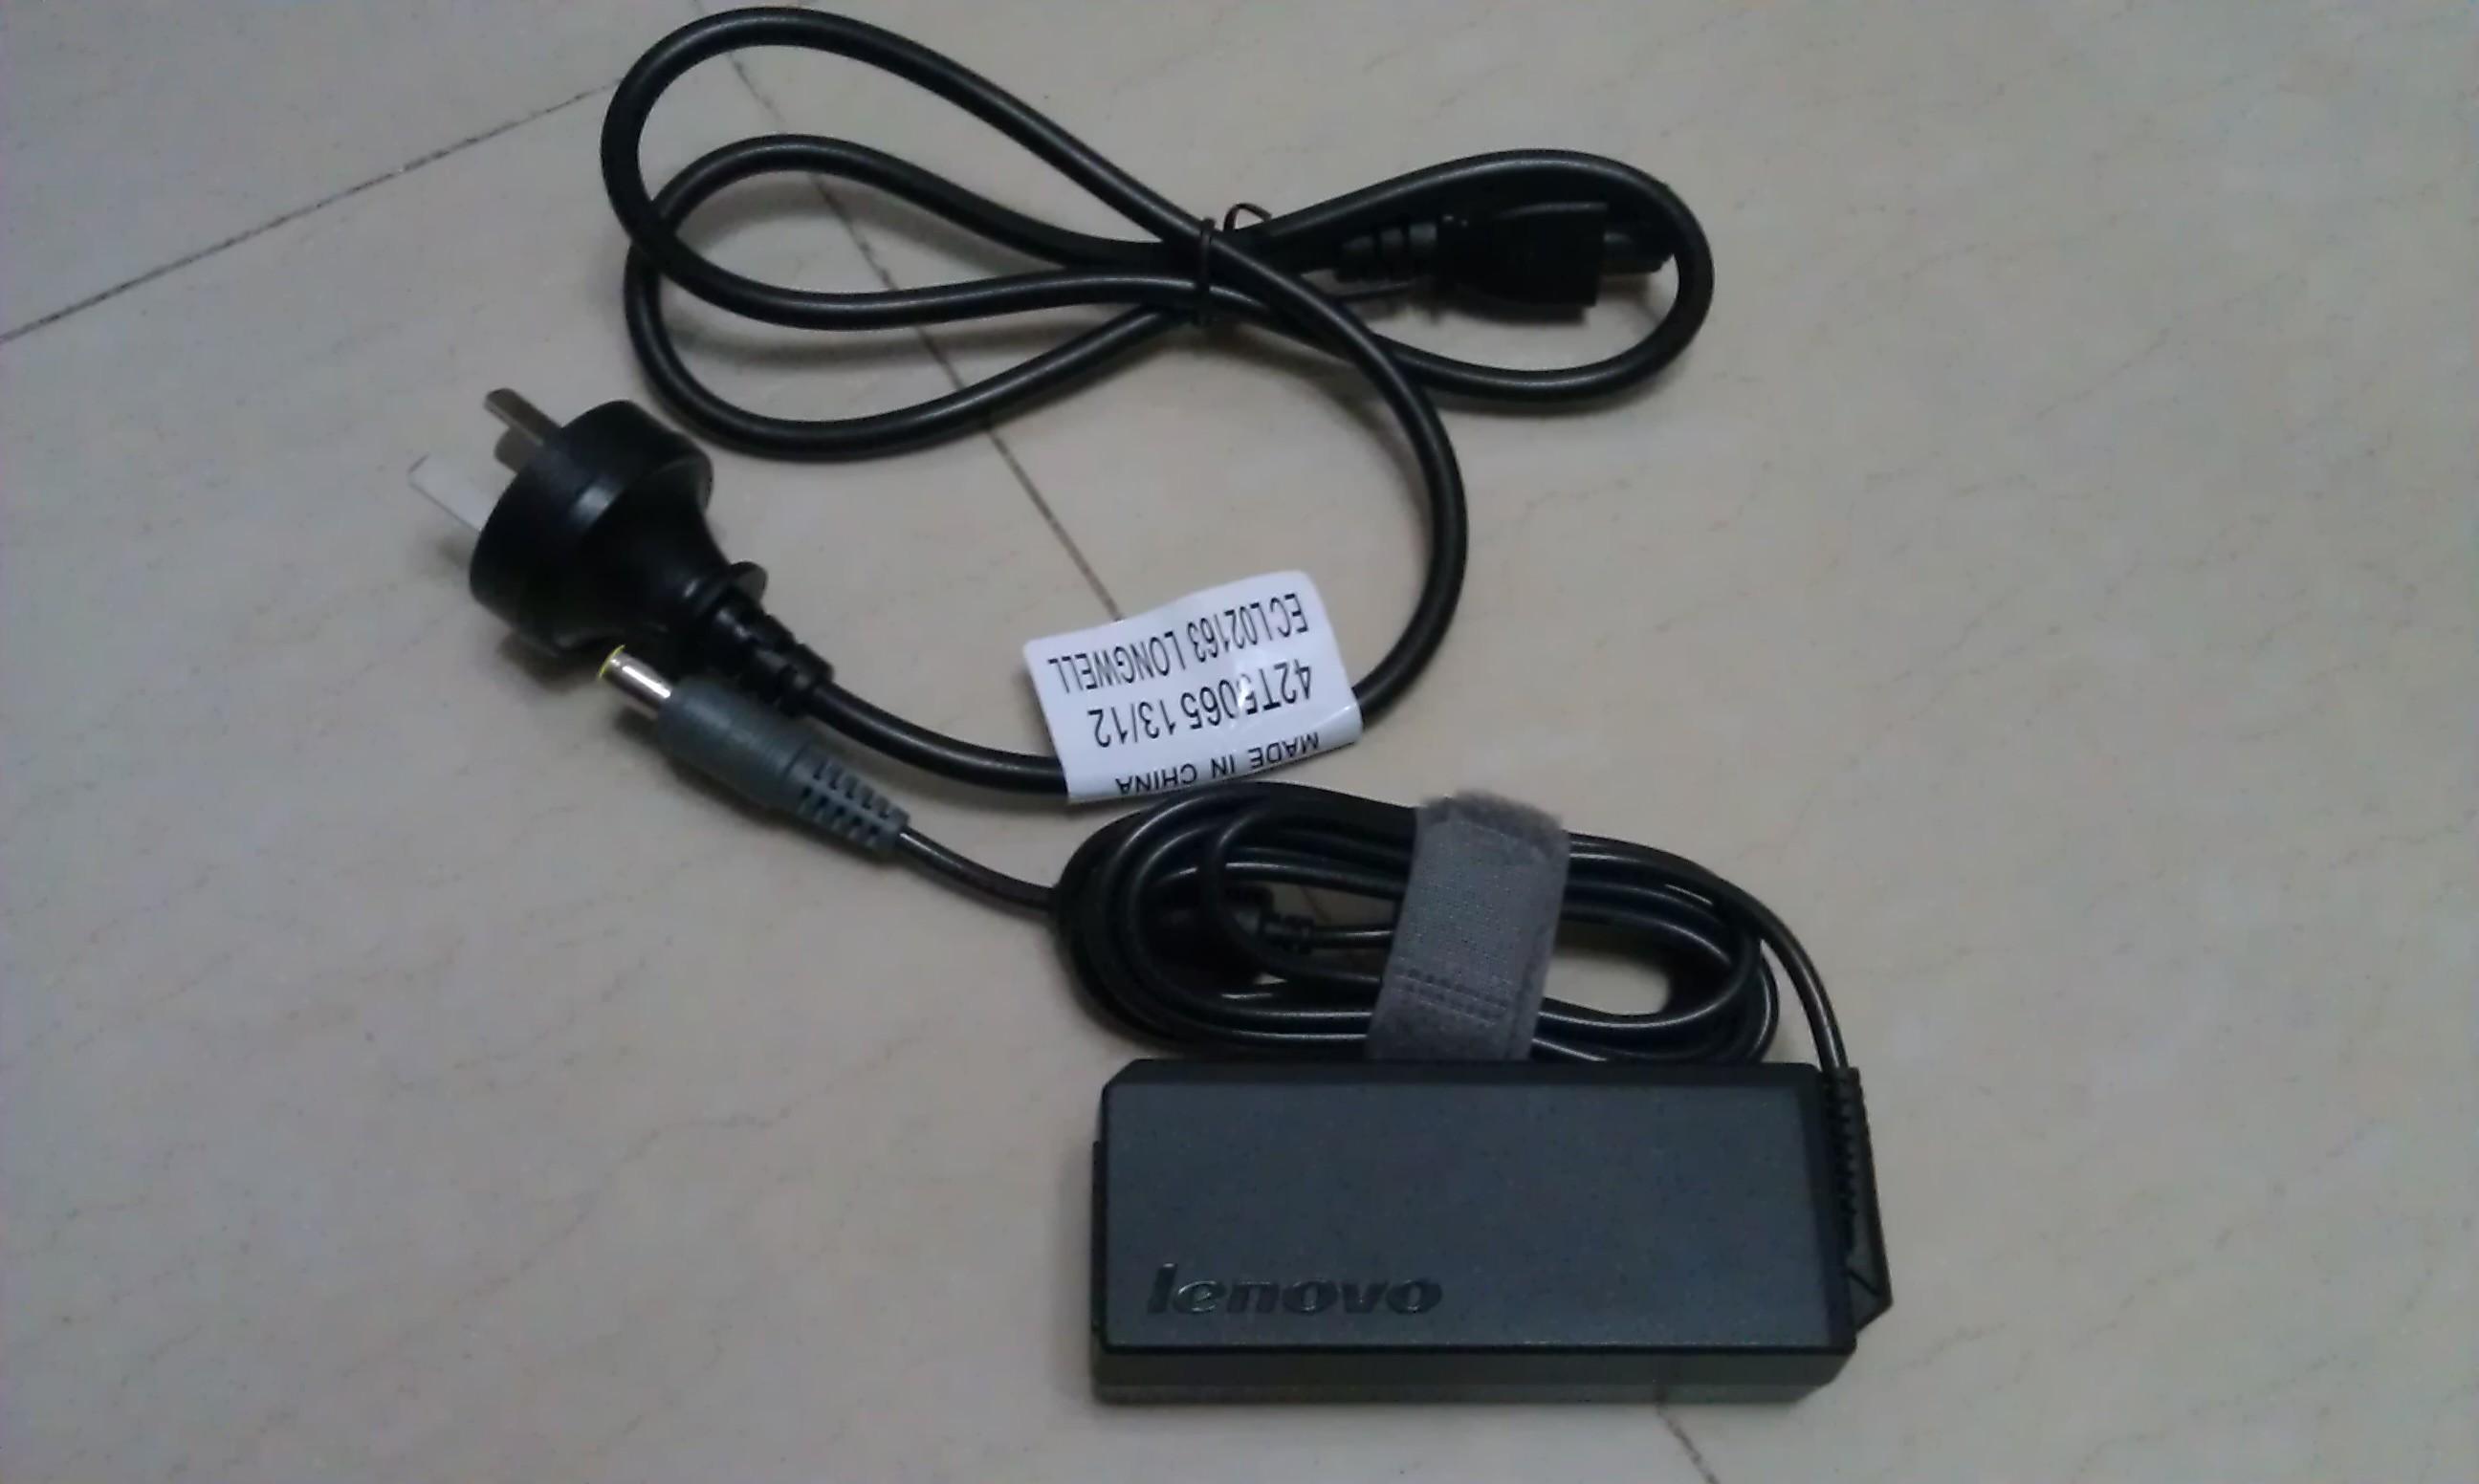 nike fuelband price in dubai 00271742 onsale